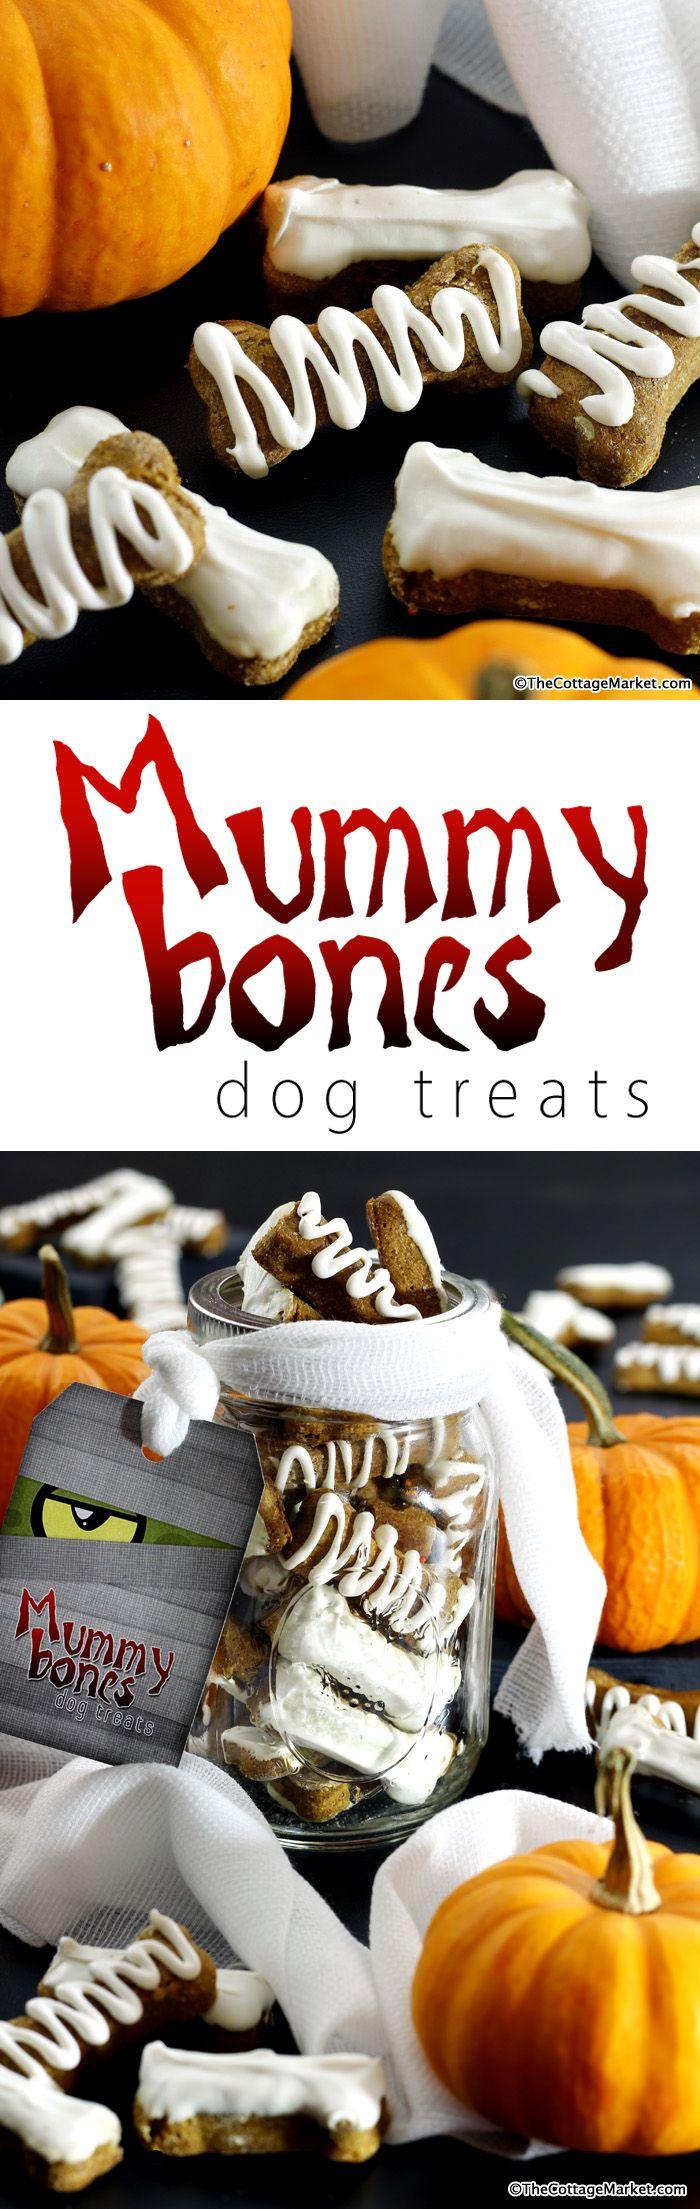 Mummy Bones Dog Treats - Perfect for Halloween!